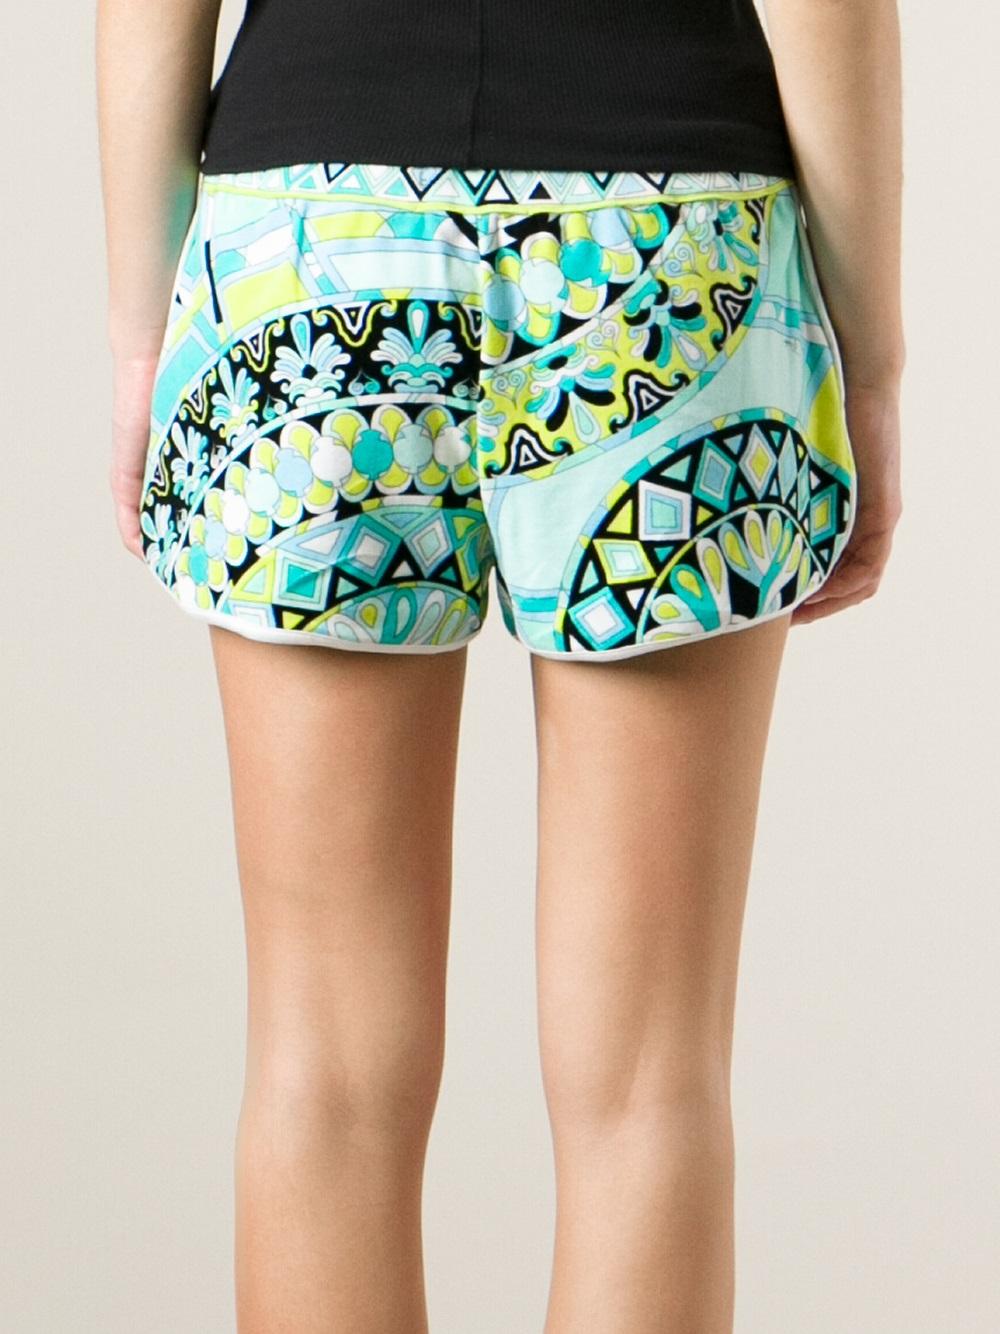 25aa181cfae8 emilio-pucci-green-pattern-print-beach-shorts-product-1-18758908-4-508047374-normal.jpeg